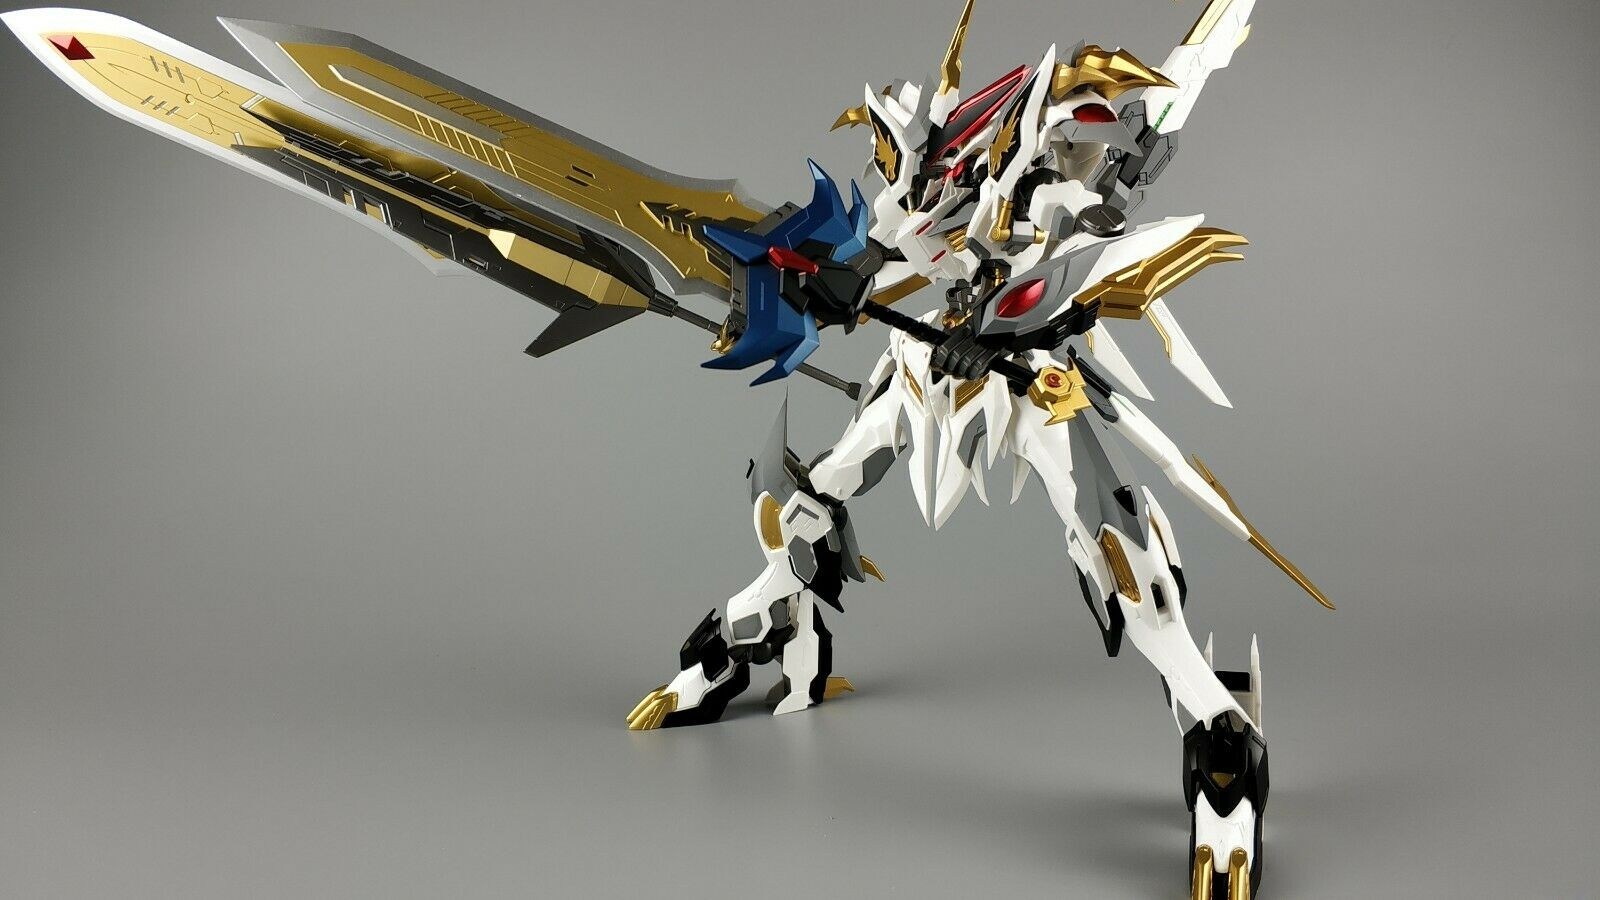 1 100 Metal Myth Barbatos Dragon King Gundam Action Figure Robot Toy Model Kit